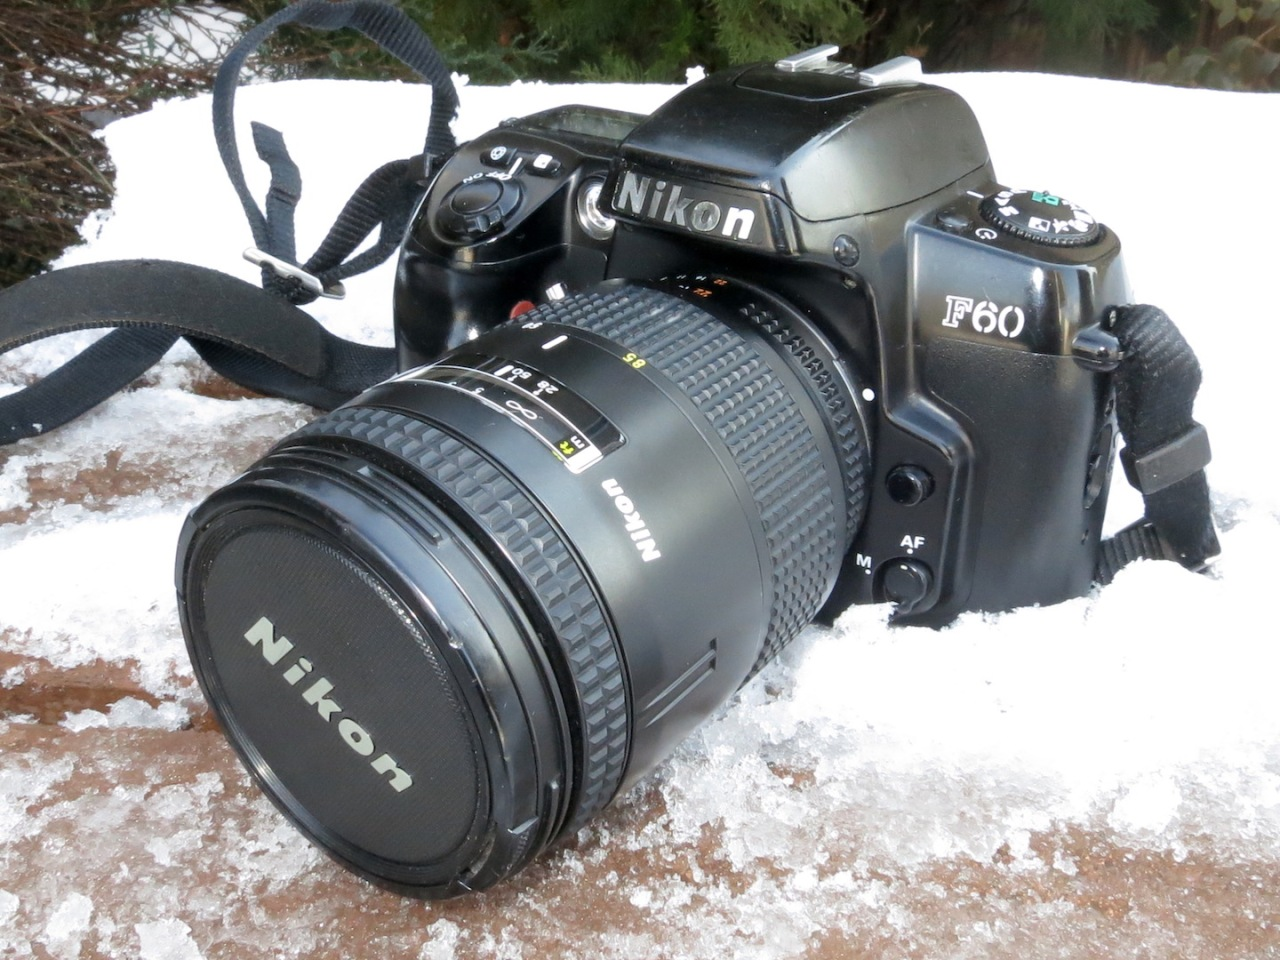 Nikon F60 (N60)